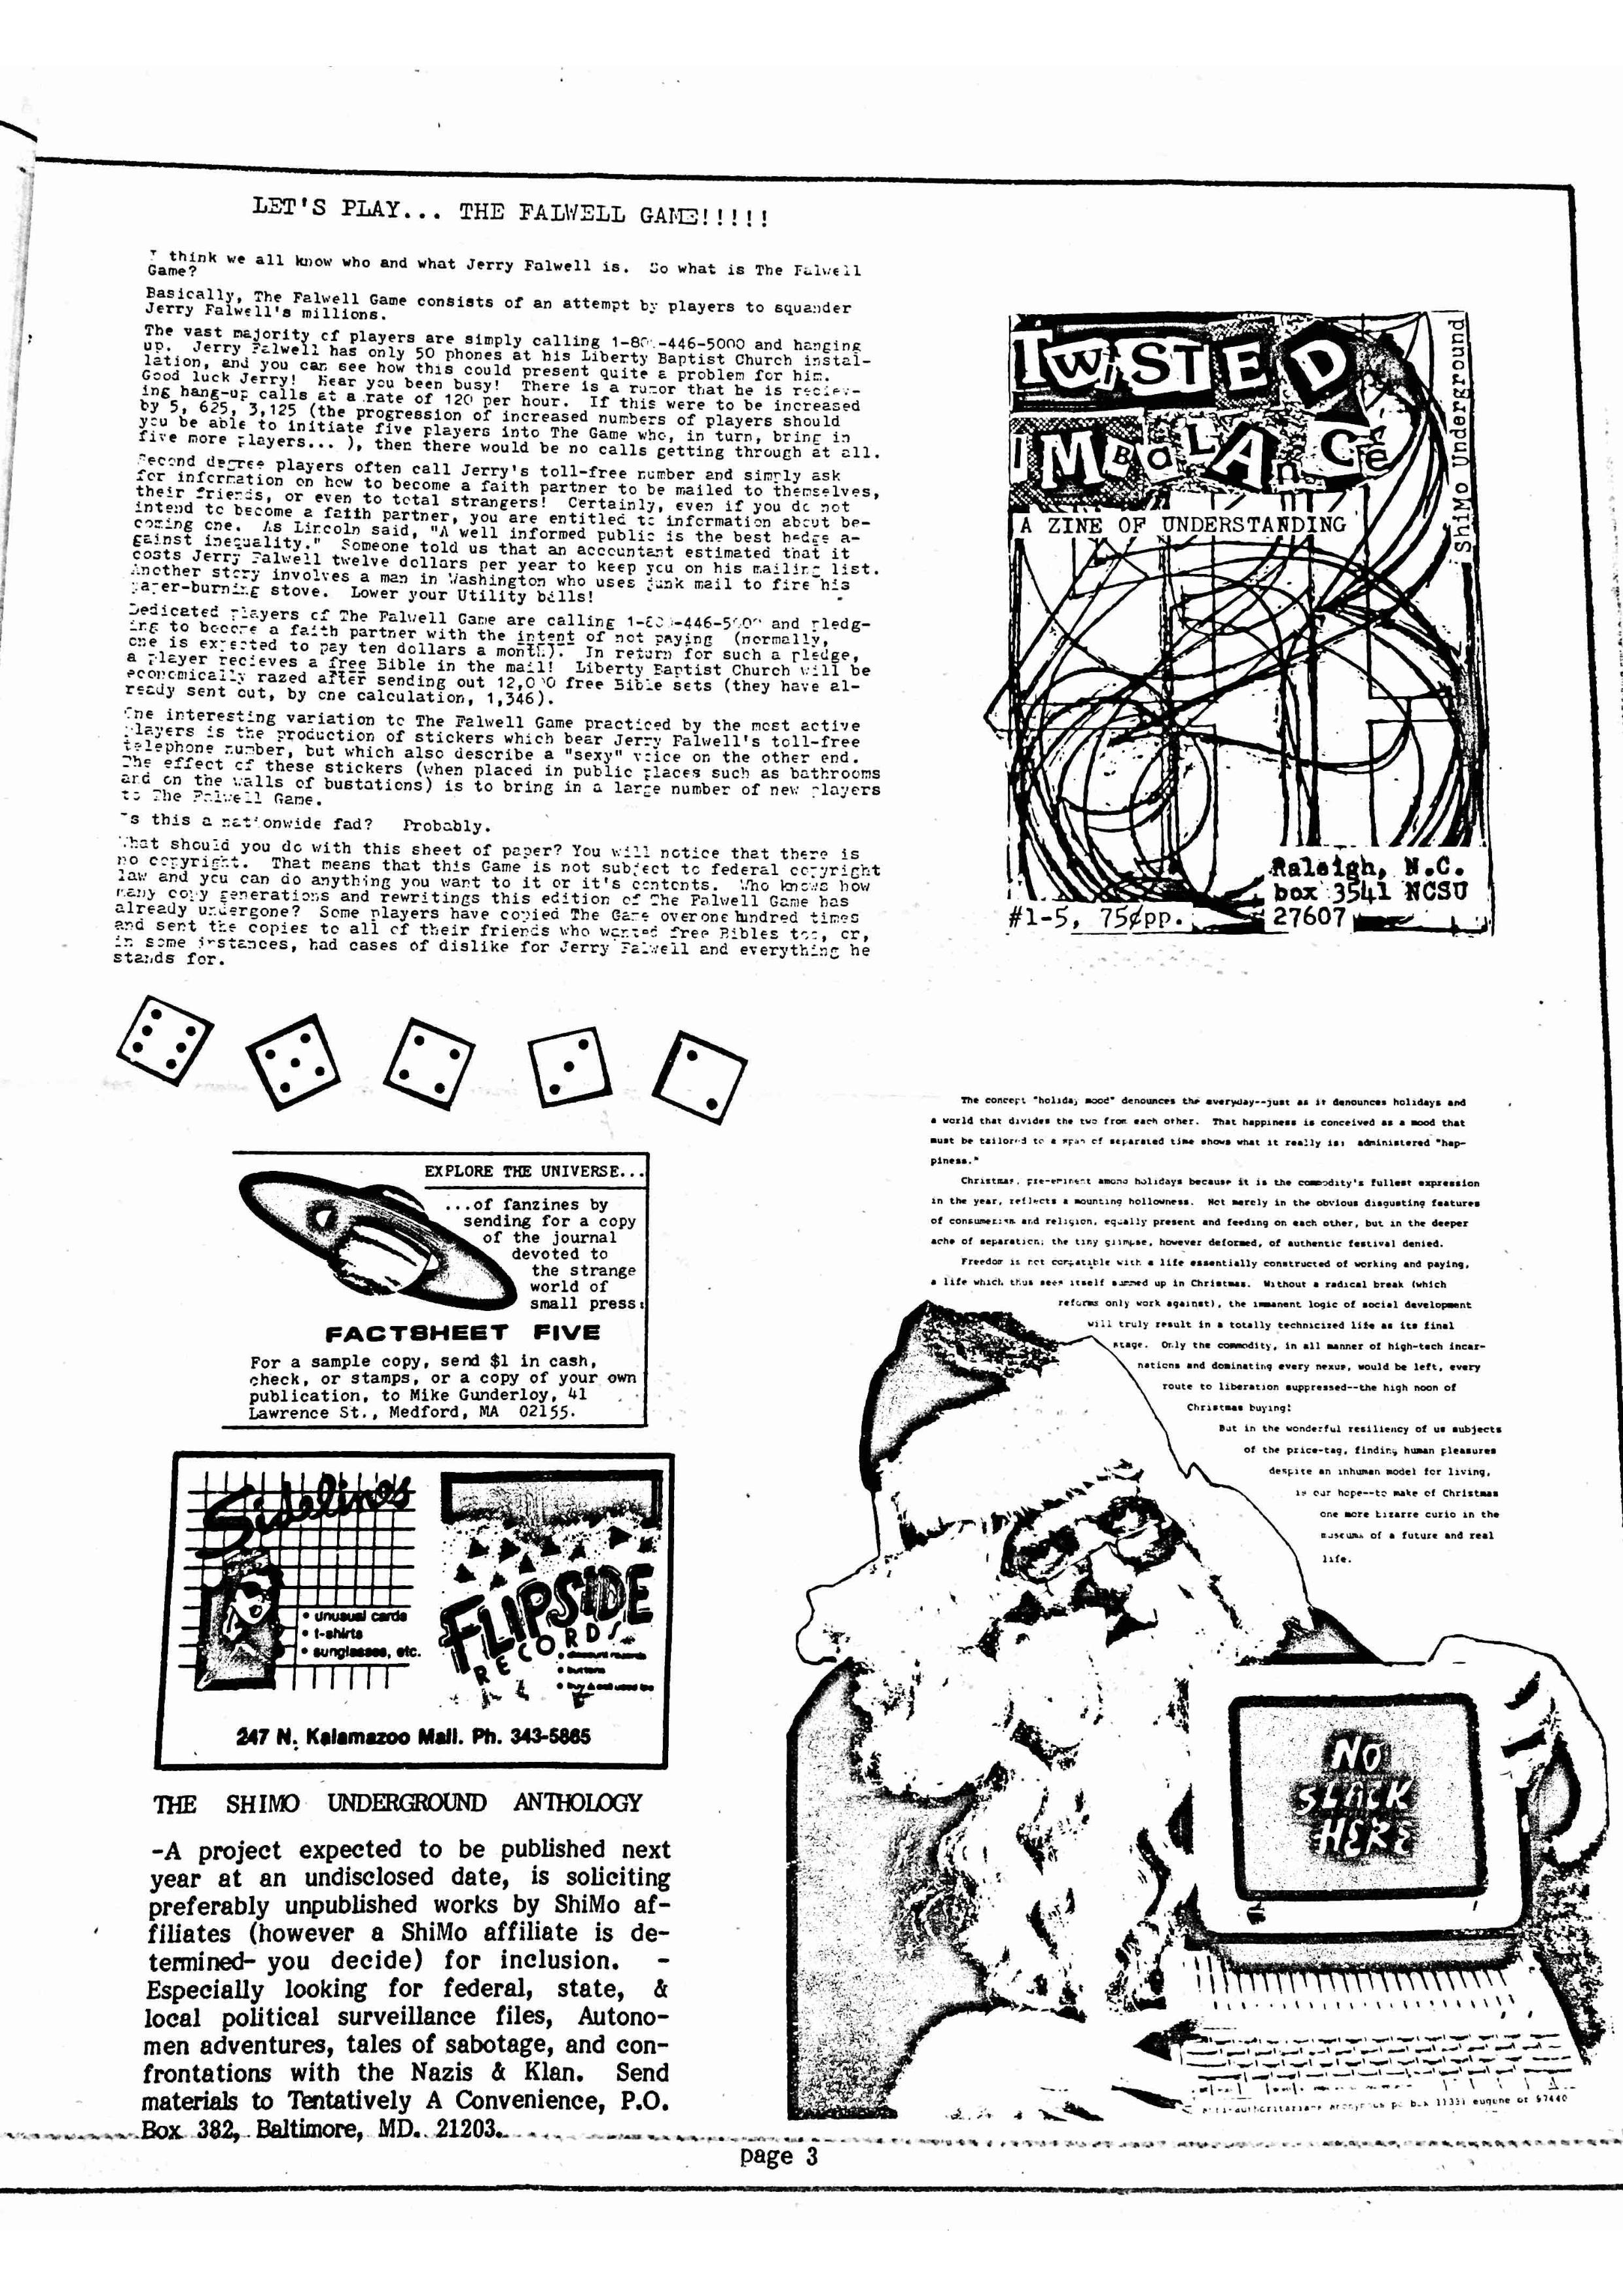 PopRealNo10-page-003.jpg